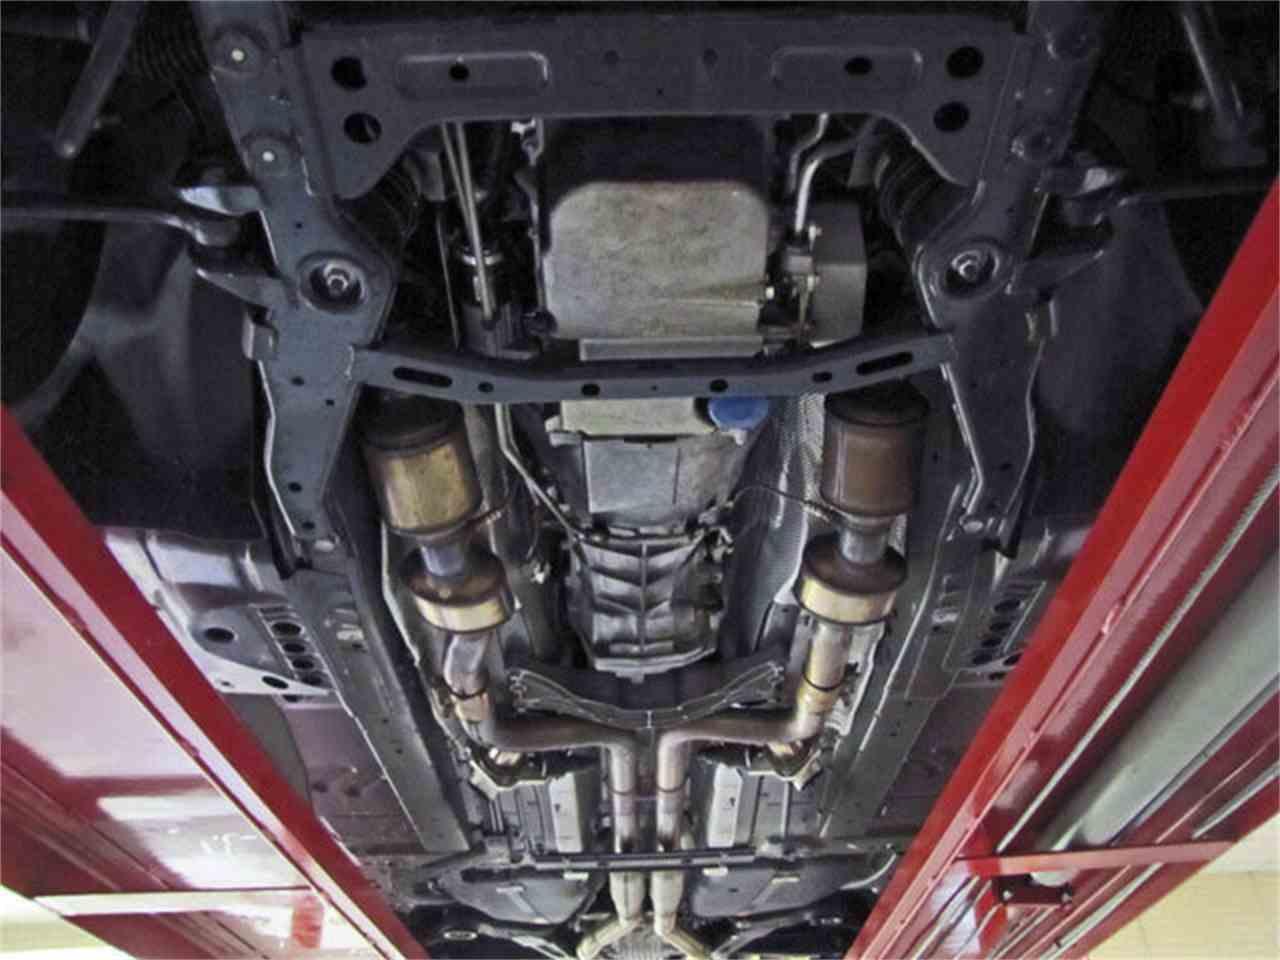 Large Picture of '10 Camaro SLP ZL 575 located in North Carolina - $39,995.00 - JQ2R